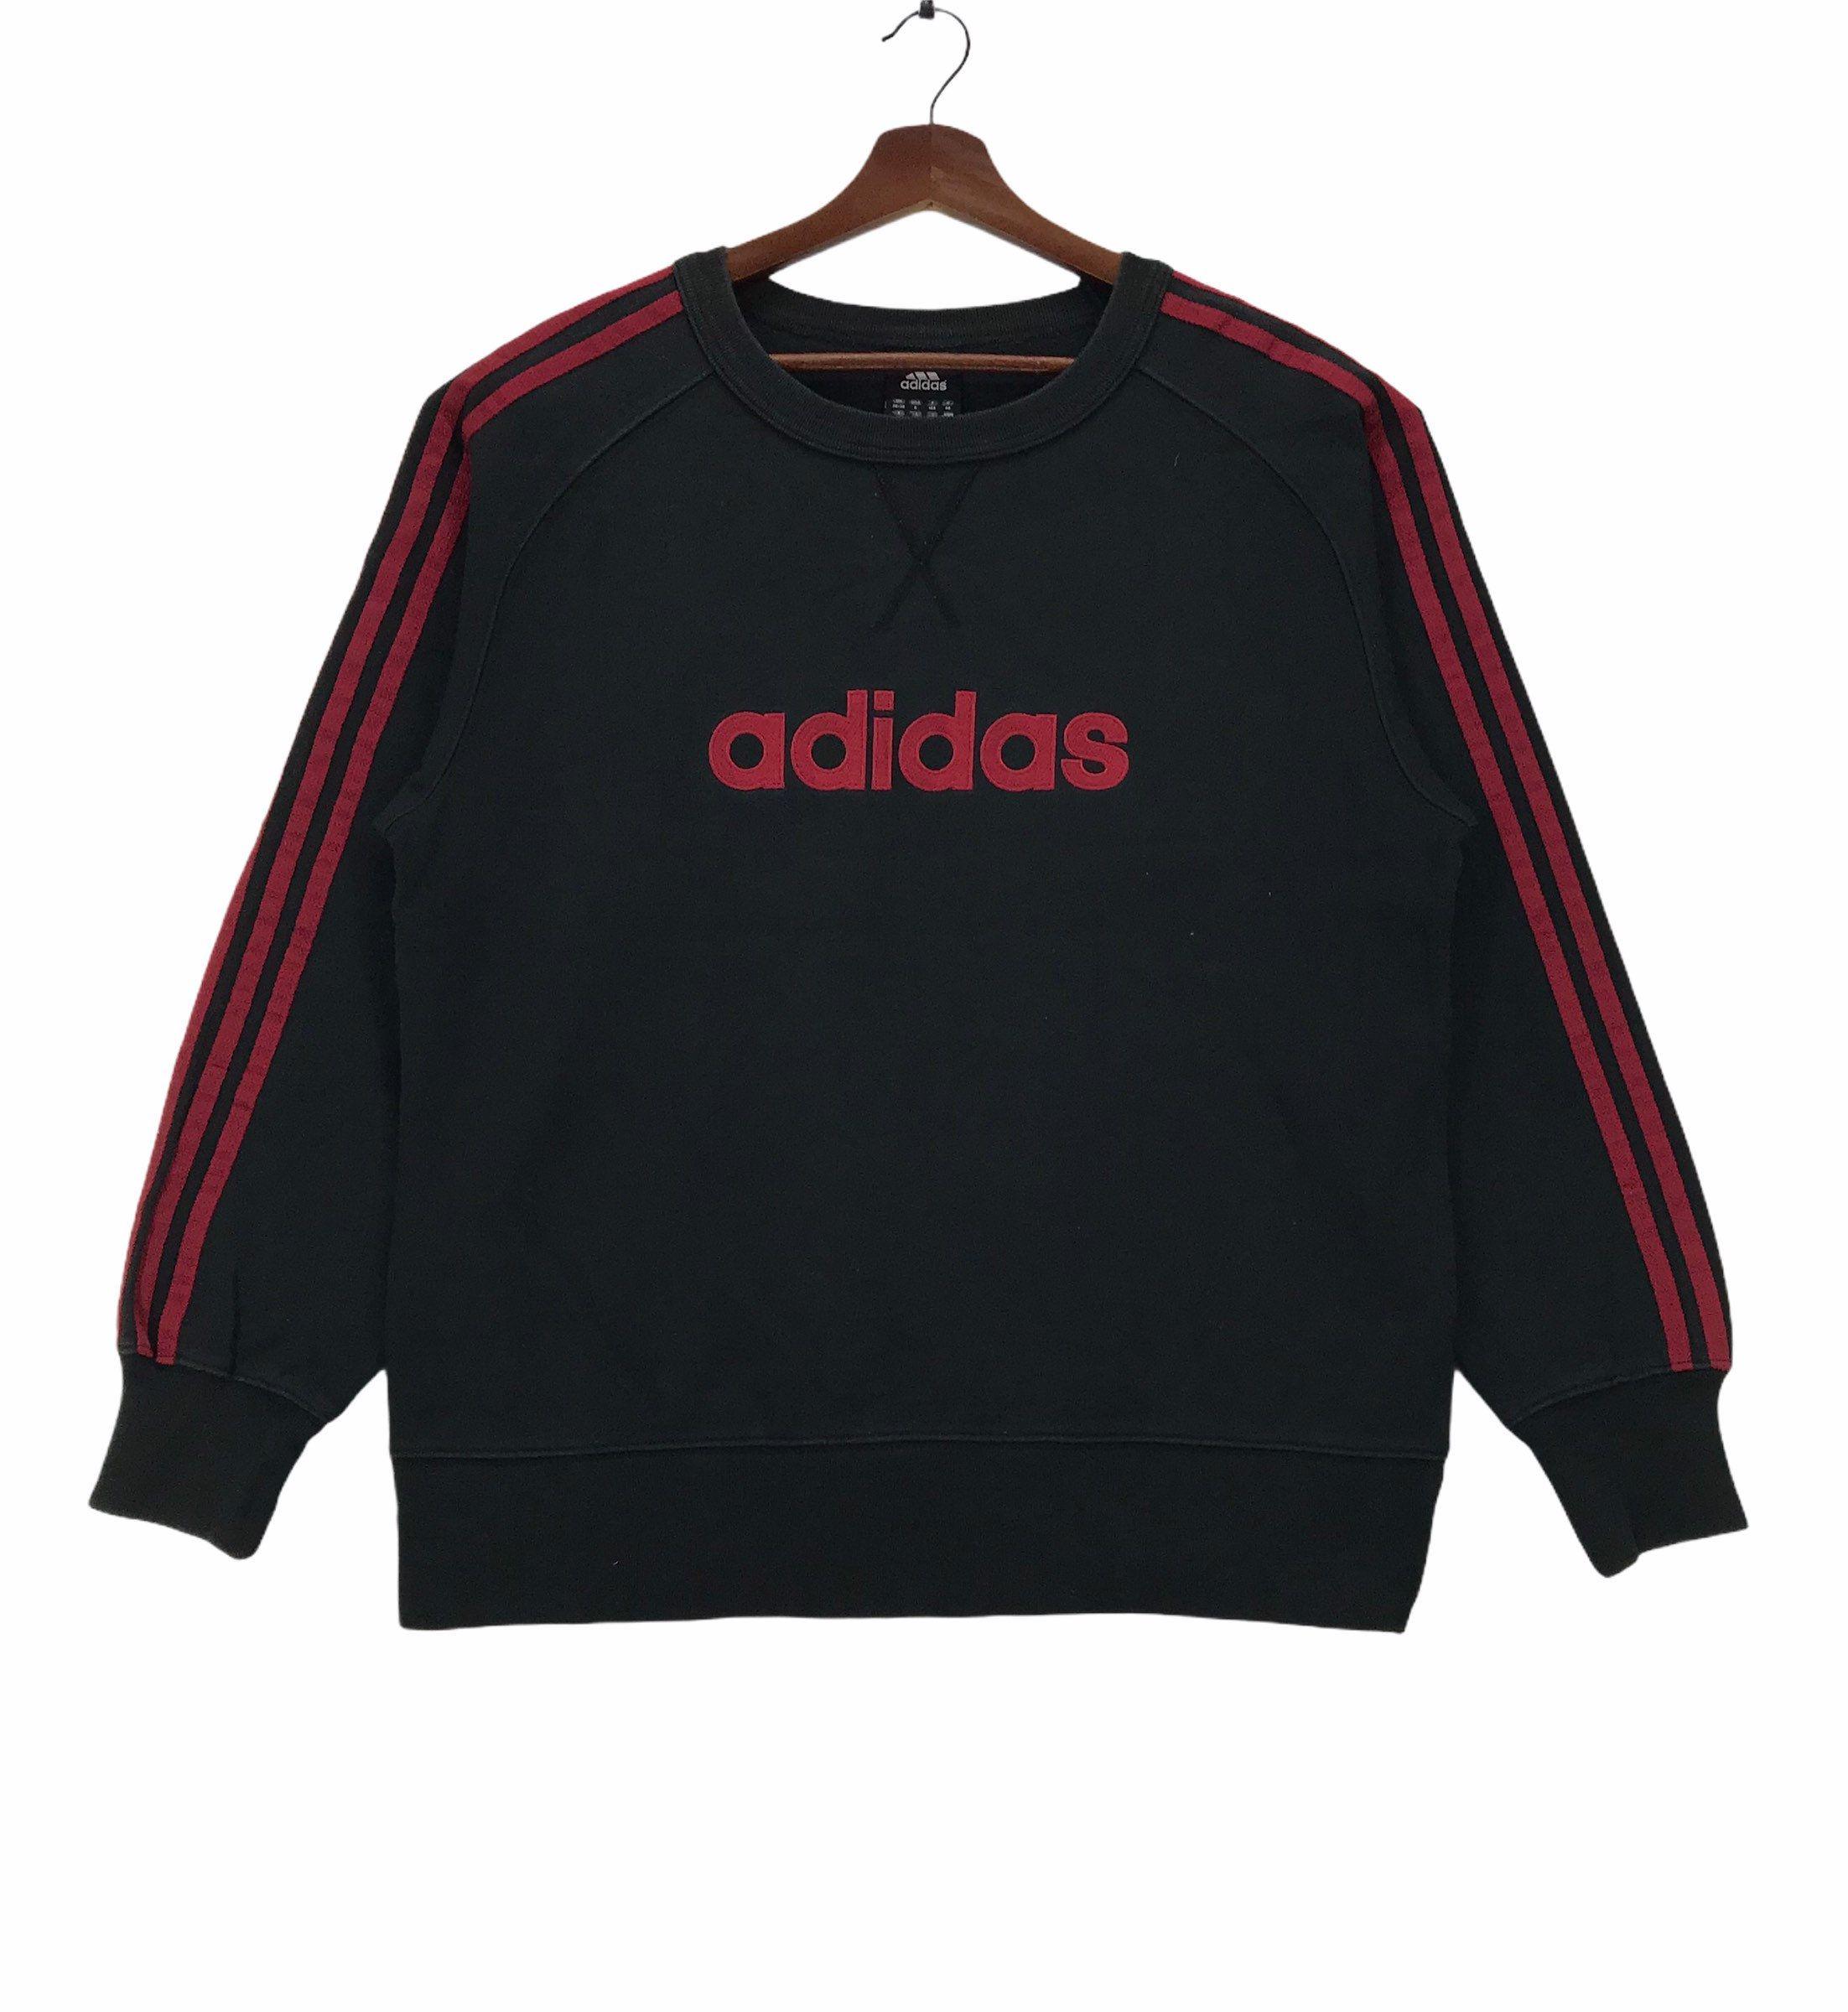 Vintage Adidas Stripe Sweatshirt Streetwear Fashion Embroidery Spellout Adidas Medium Size Vintage Sweatshirt B Sweatshirts Vintage Adidas Striped Sweatshirts [ 2400 x 2204 Pixel ]